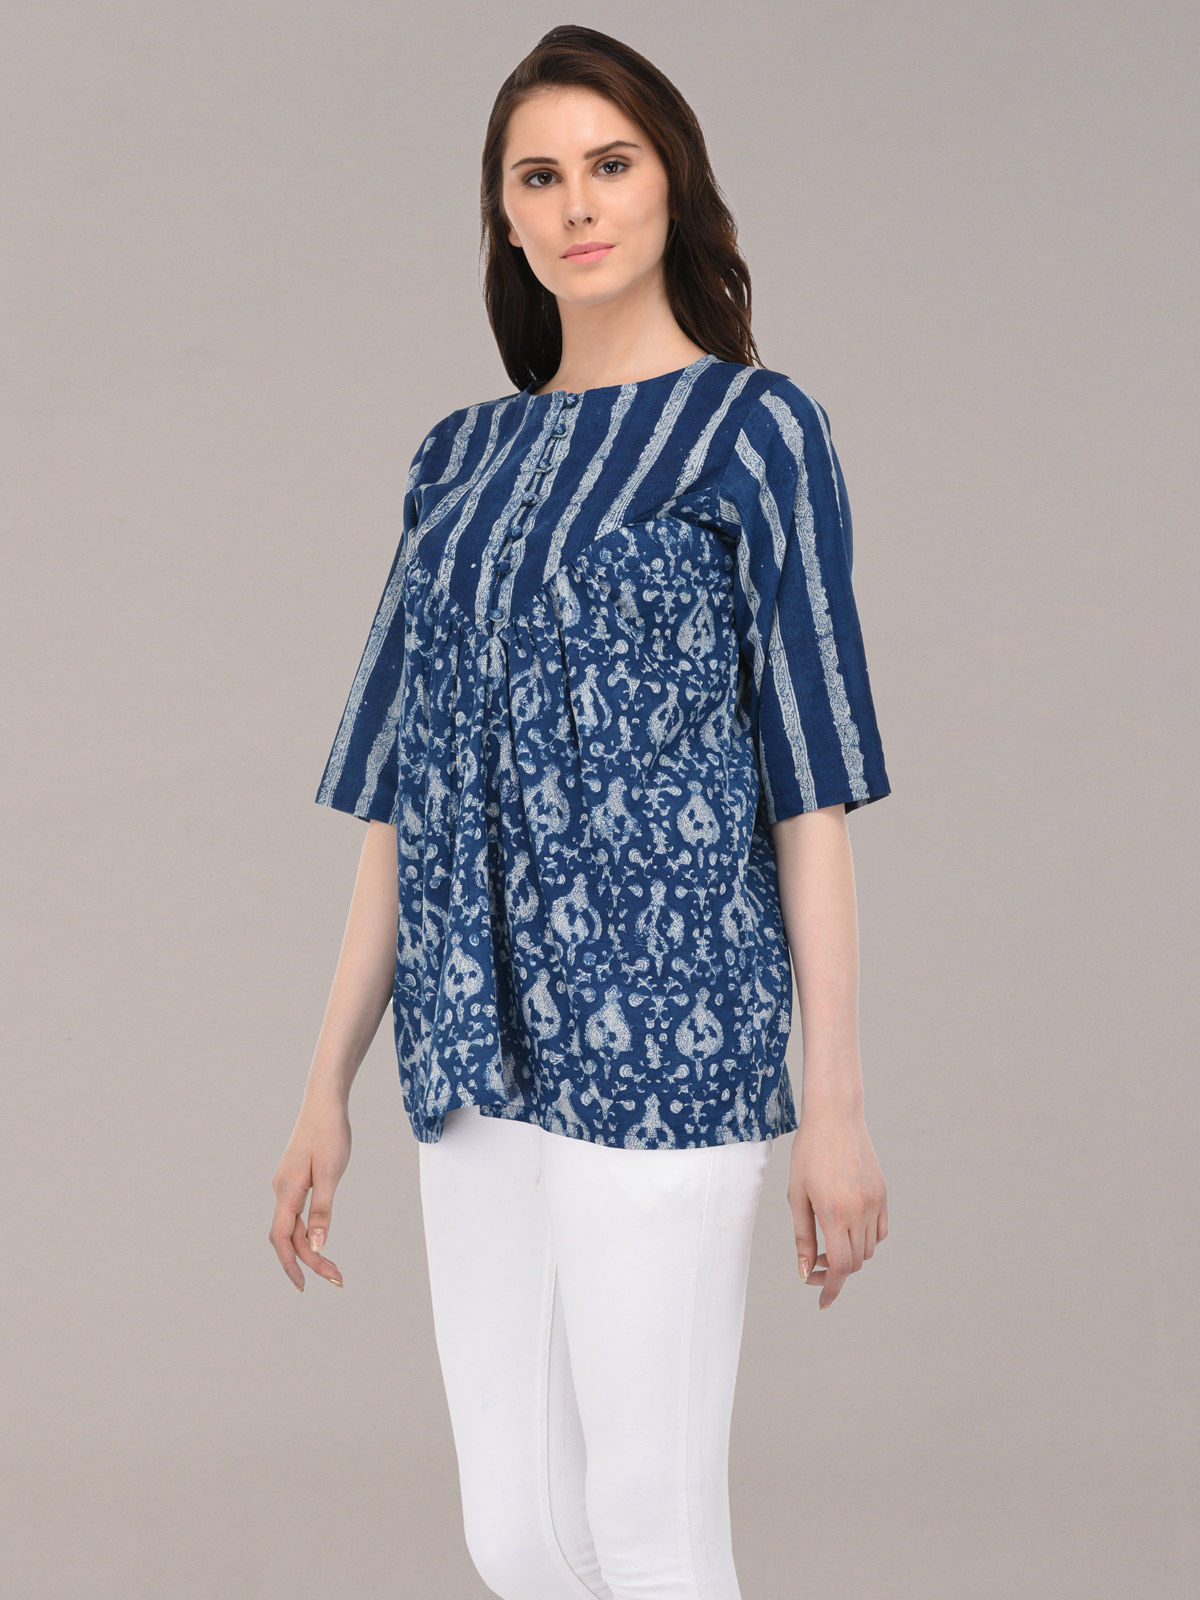 Azure indigo color hand-block printed  cotton top